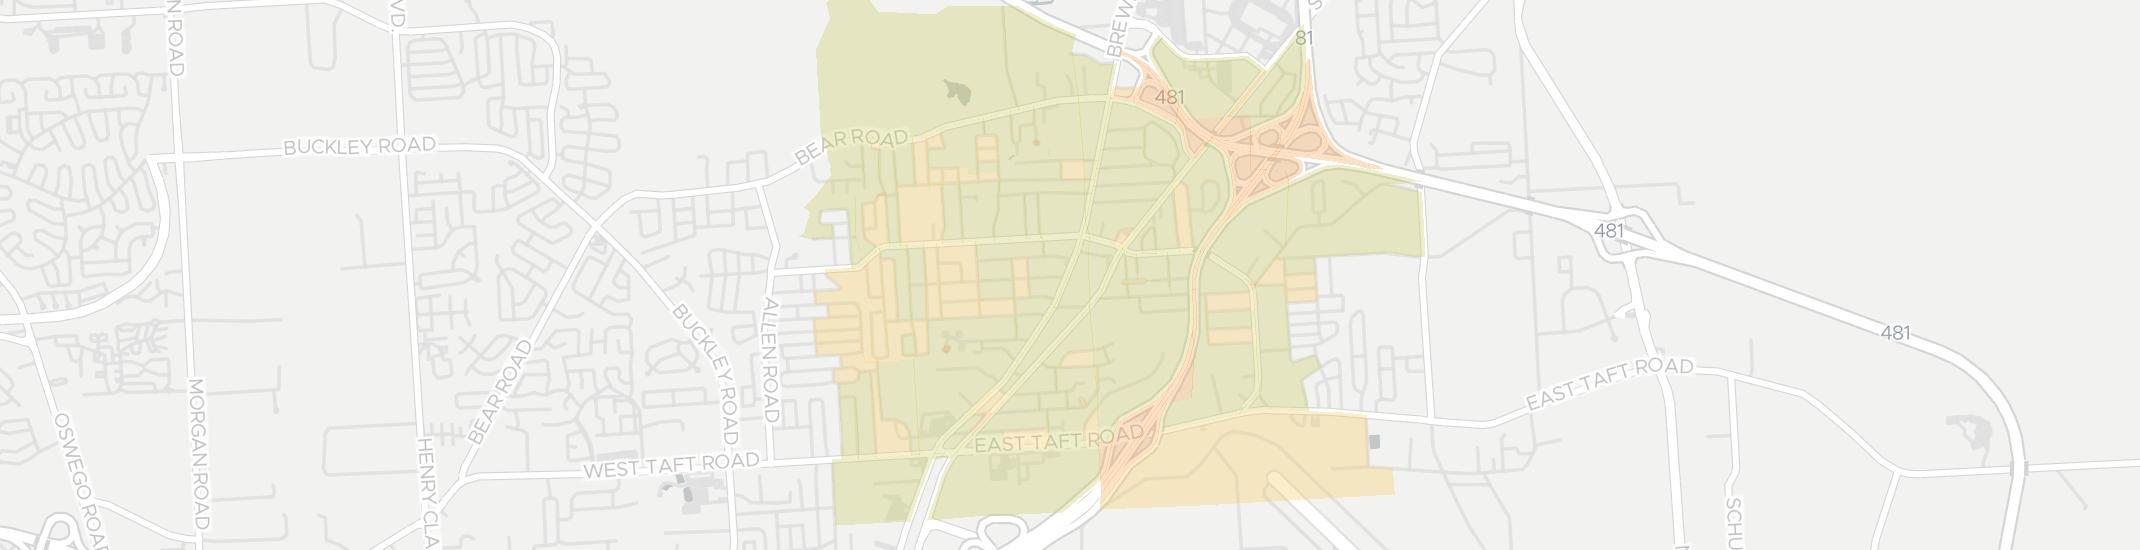 Internet Providers in North Syracuse, NY: Compare 16 Providers